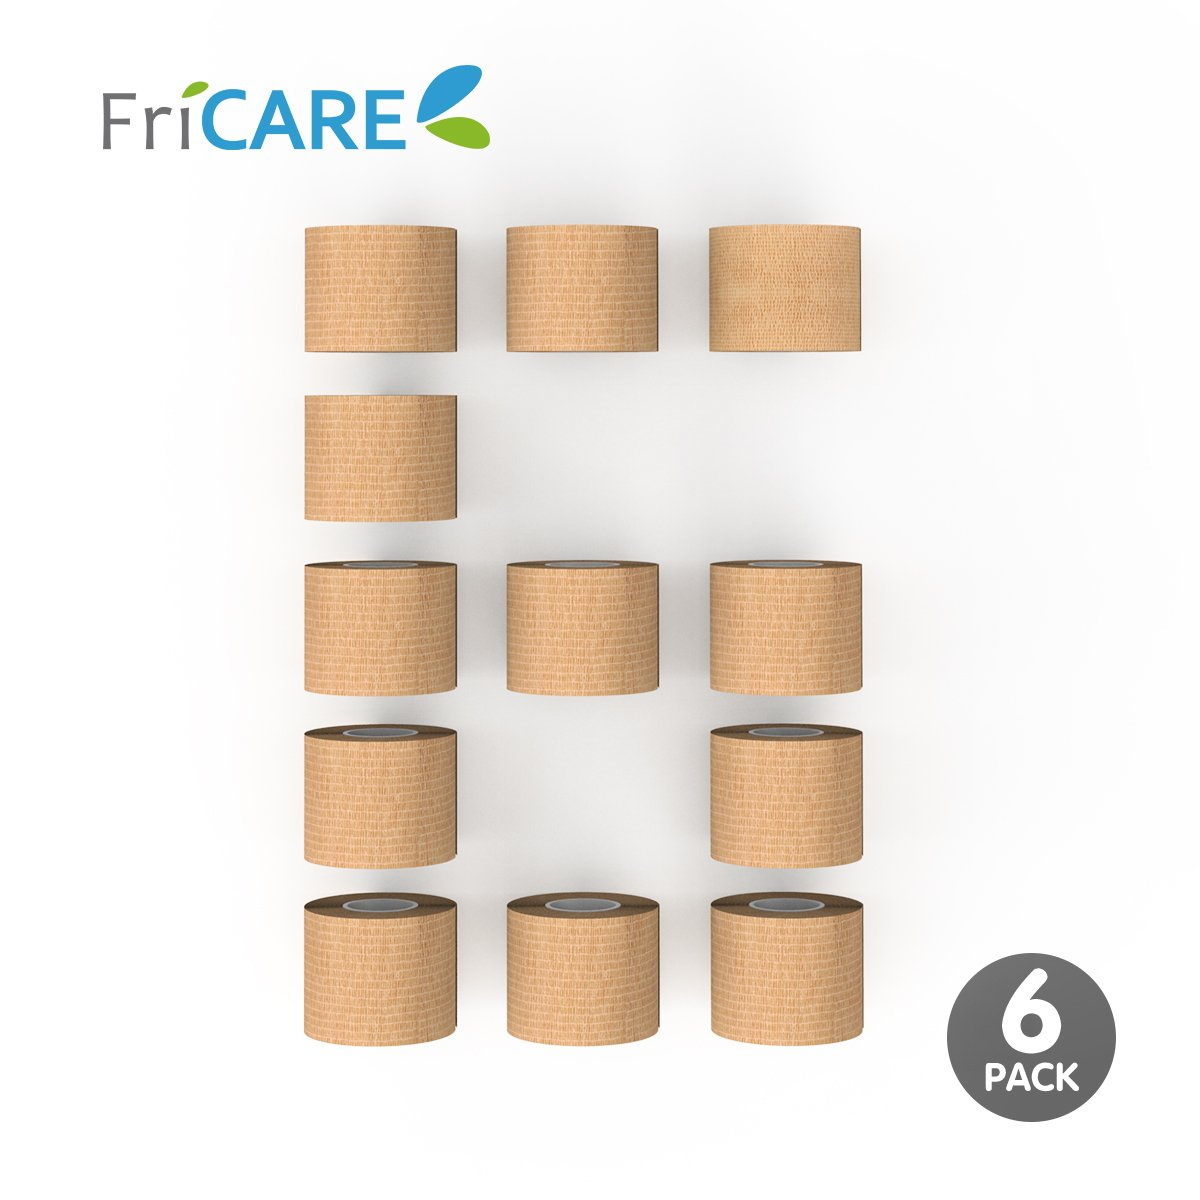 FriCARE 弾力包帯 エラスティック テープ 指 足首 手首 ひじ 捻挫 対策 ベージュ 幅2インチ 6巻入り   B06XRC233S